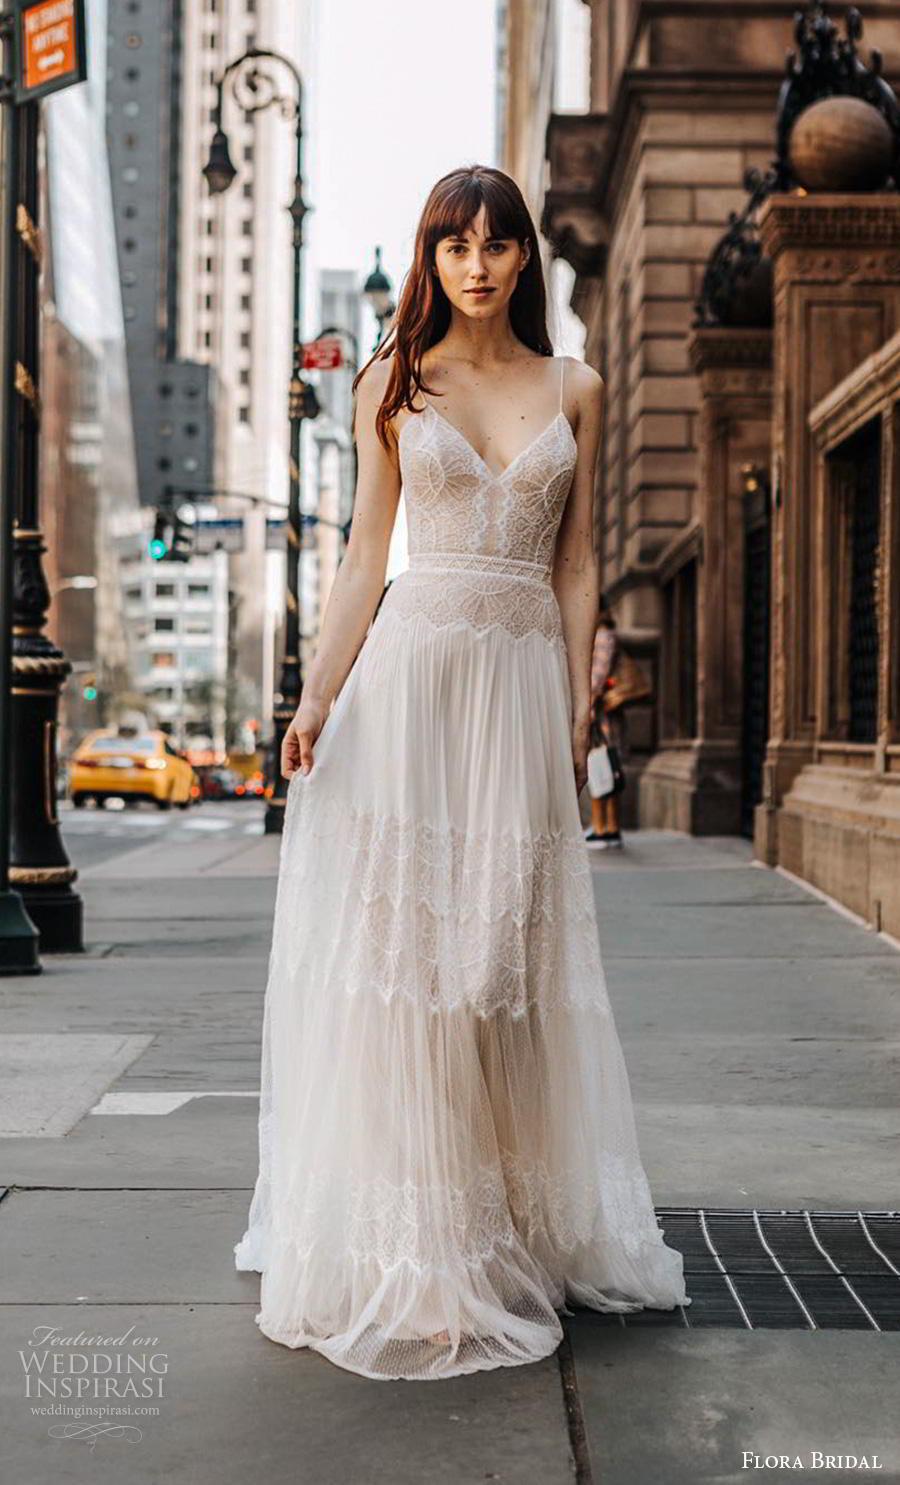 flora bridal 2019 bridal sleeveless spaghetti strap diamond neck heavily embellished bodice romantic bohemian soft a  line wedding dress backless low back sweep train (1) mv